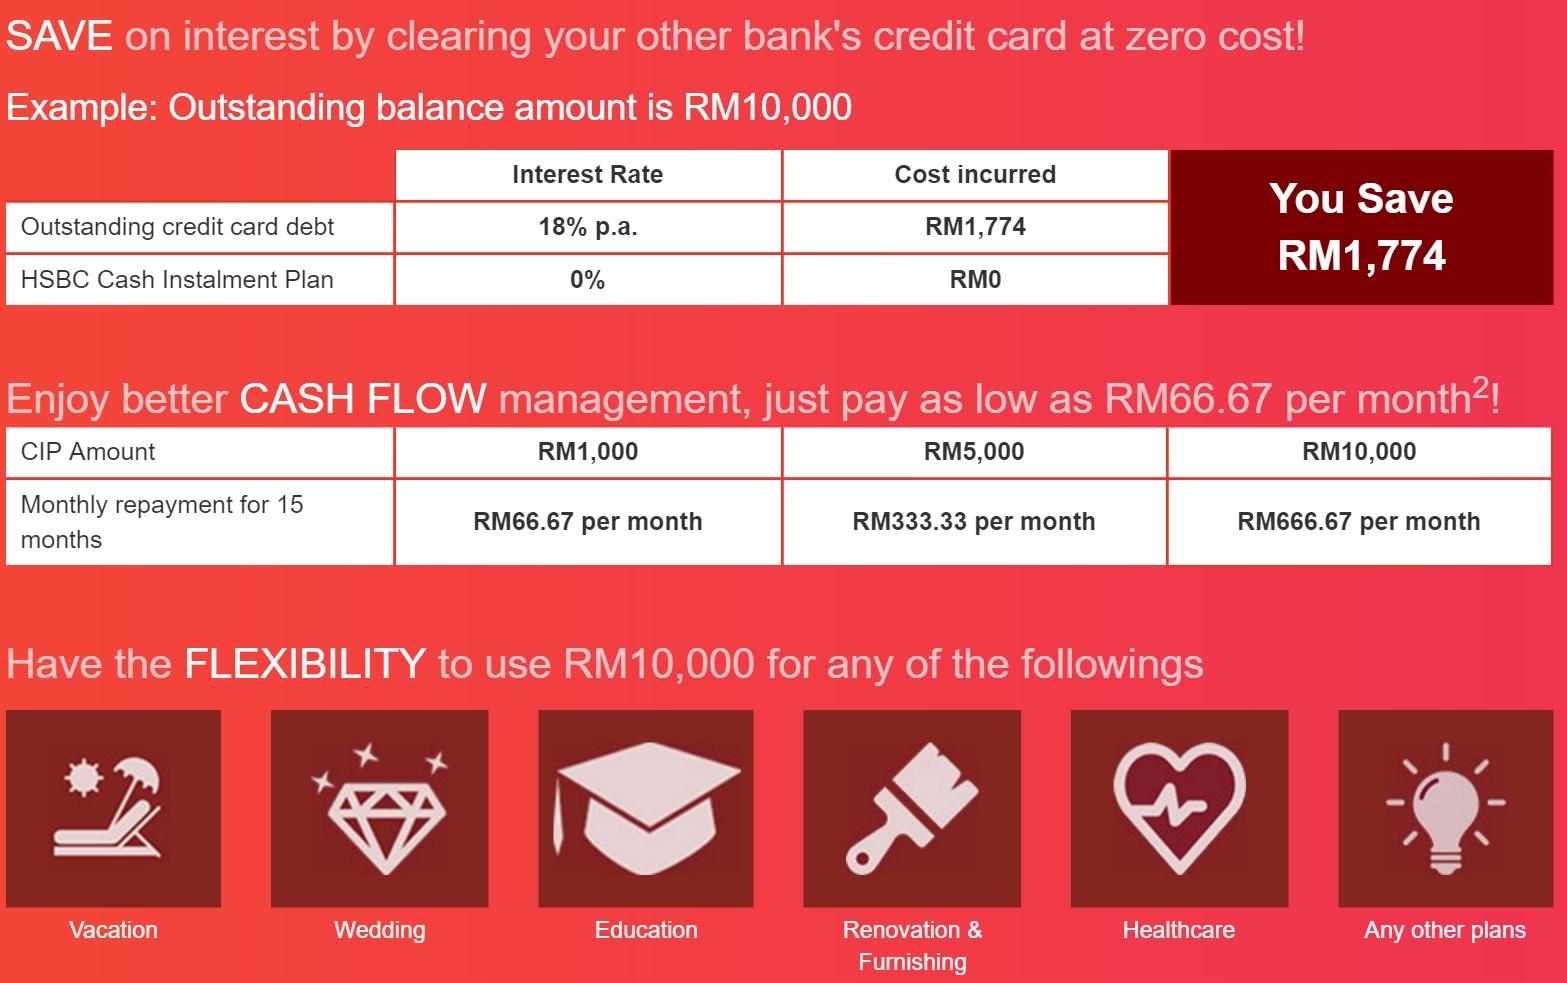 how to make cash advance on hsbc credit card